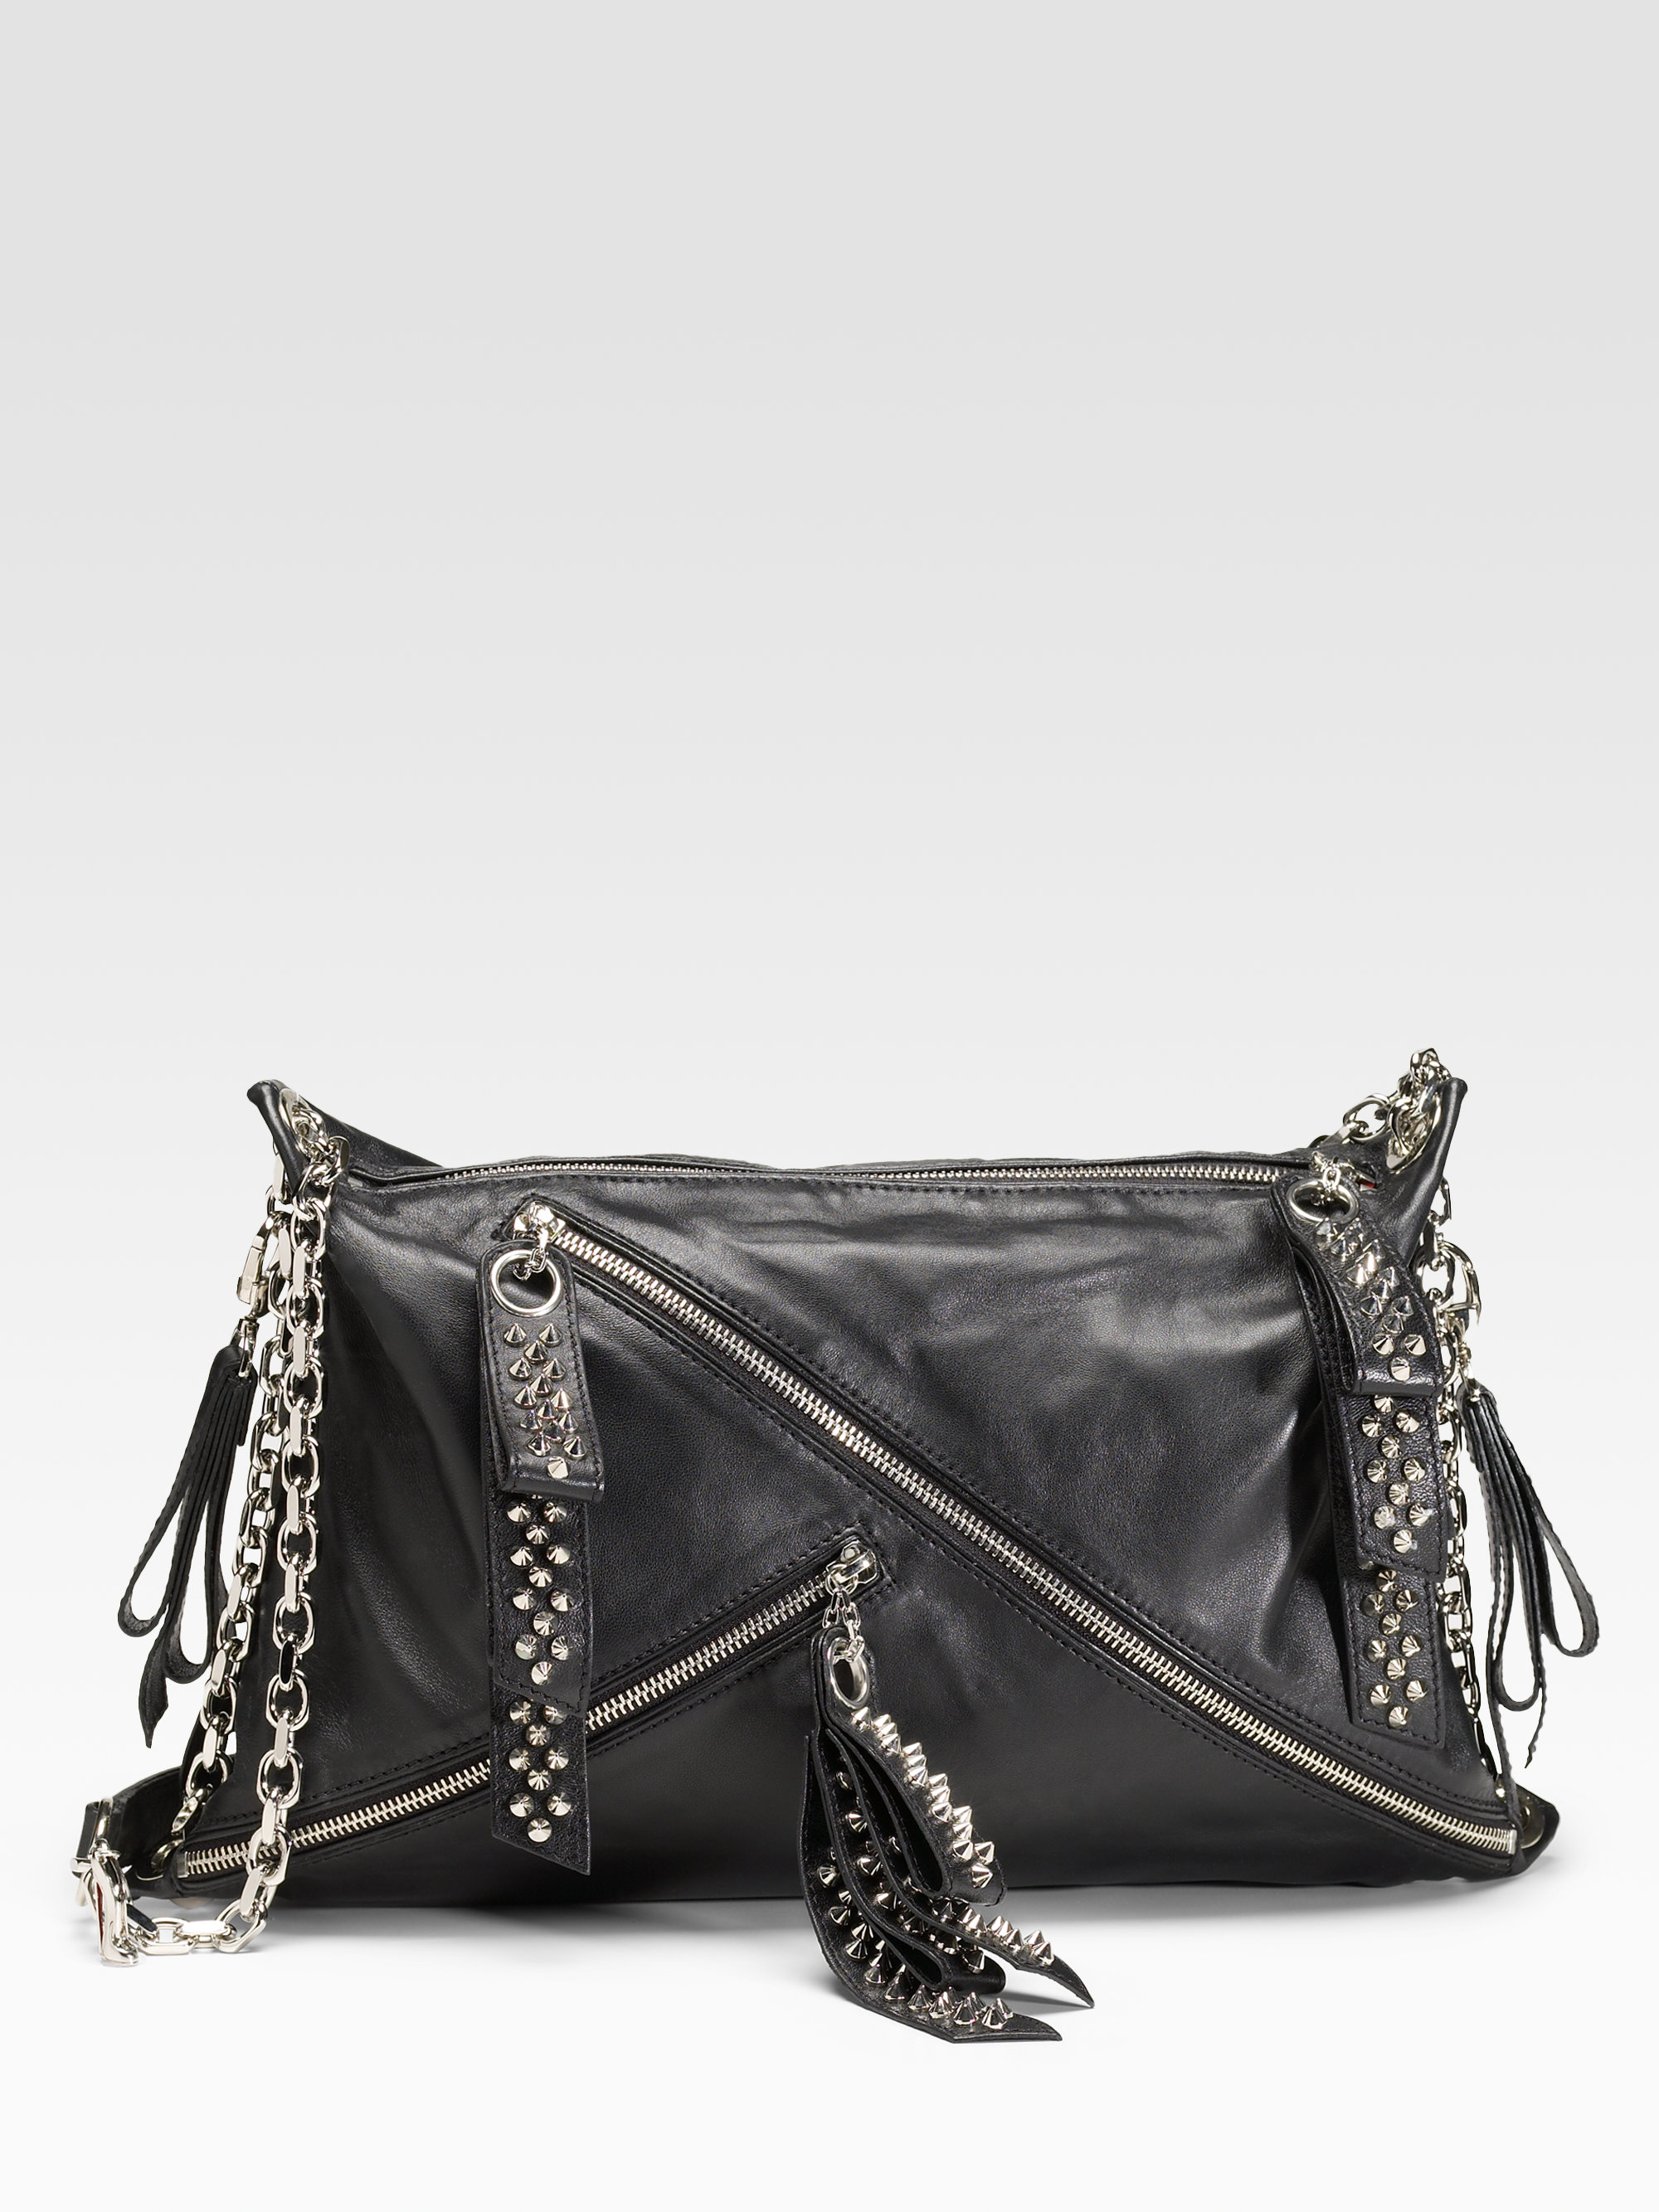 925fb206e63 Christian Louboutin Black Trophe Studded Nappa Bag